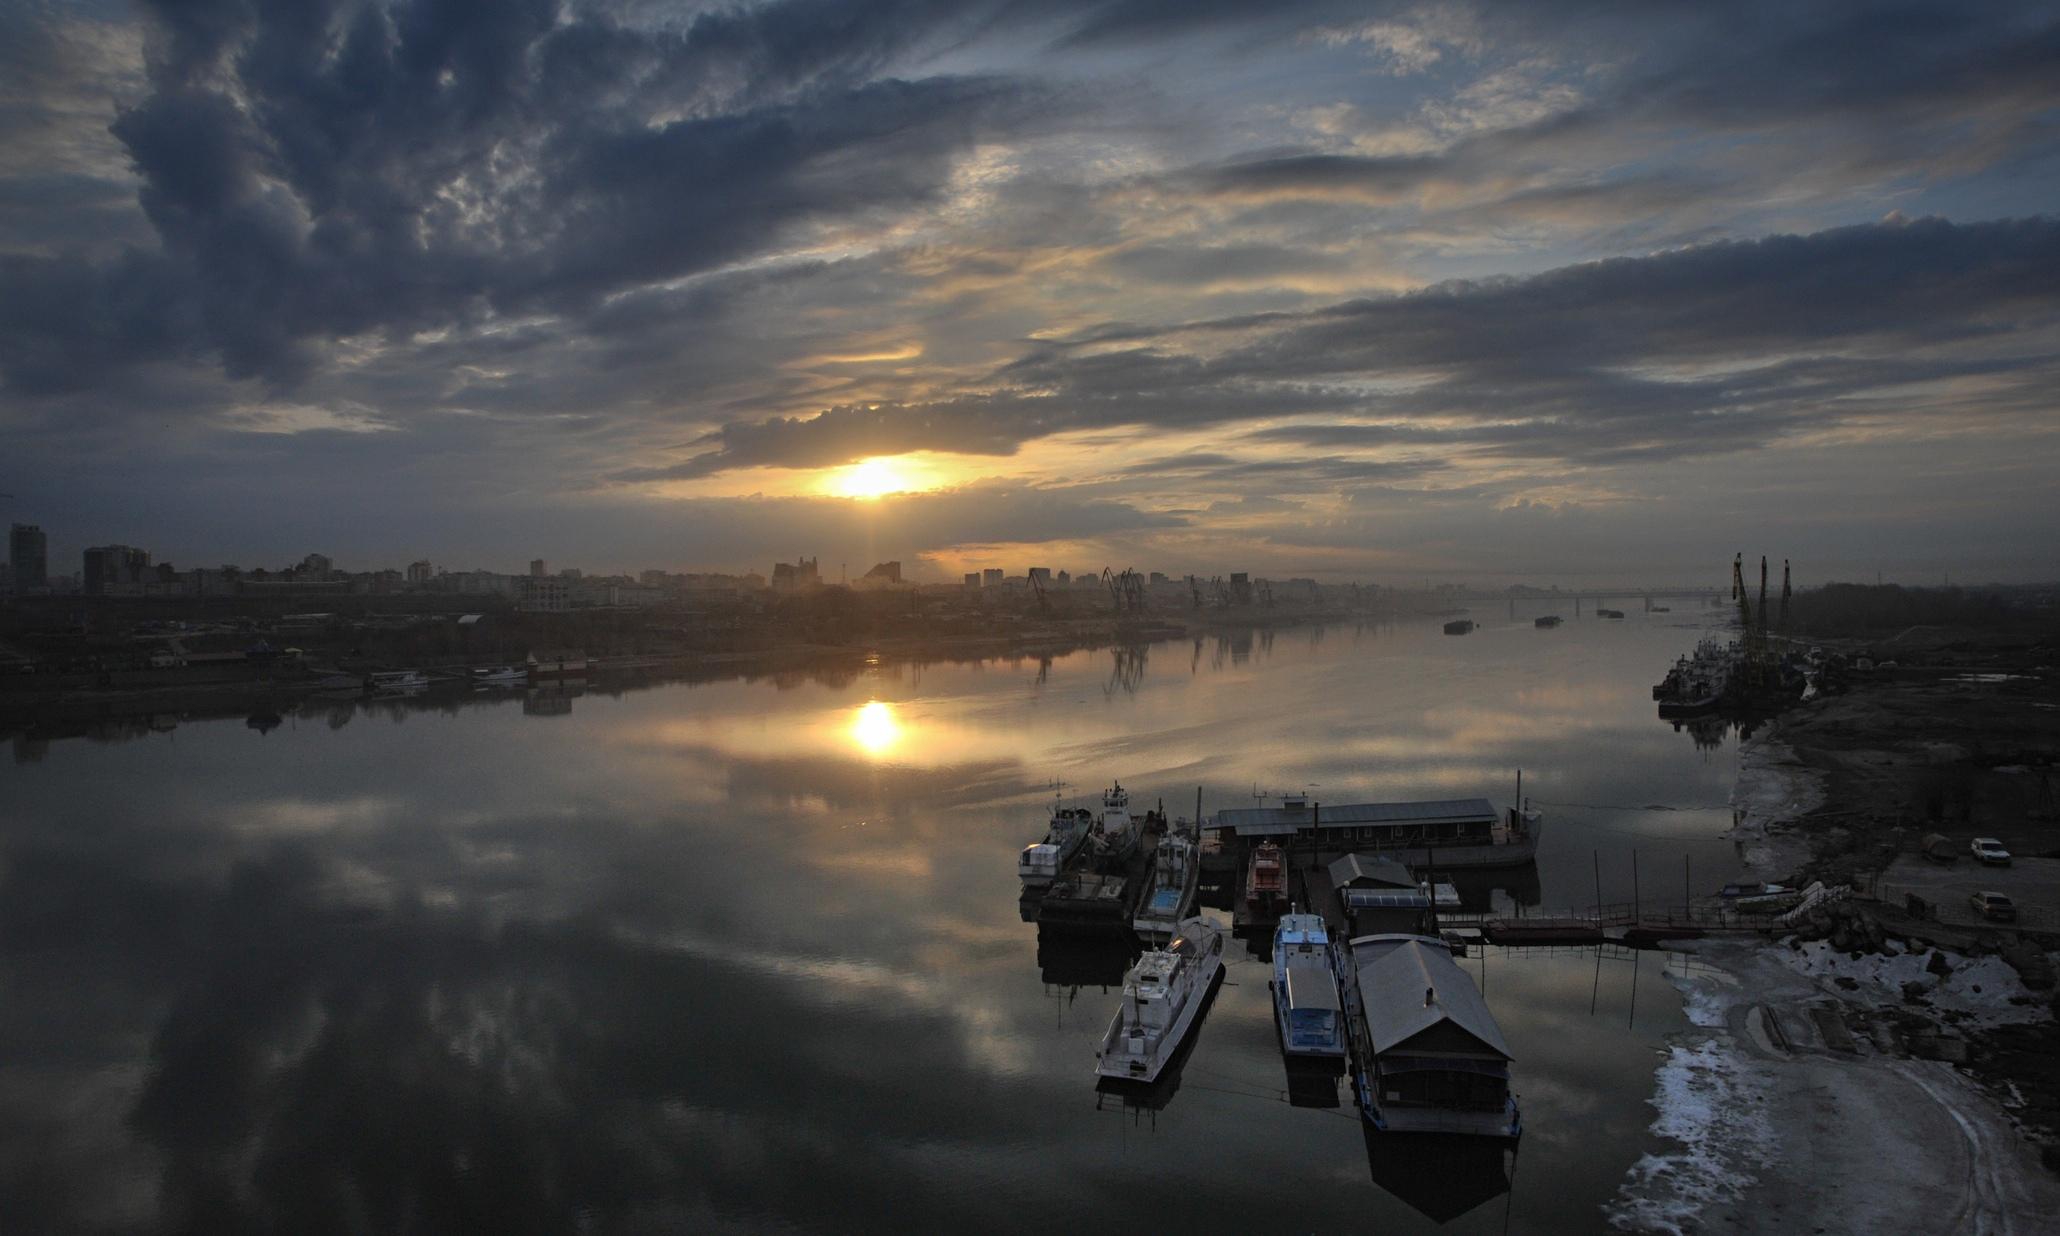 Sunrise over the Ob River near Novosibirsk, Siberia.